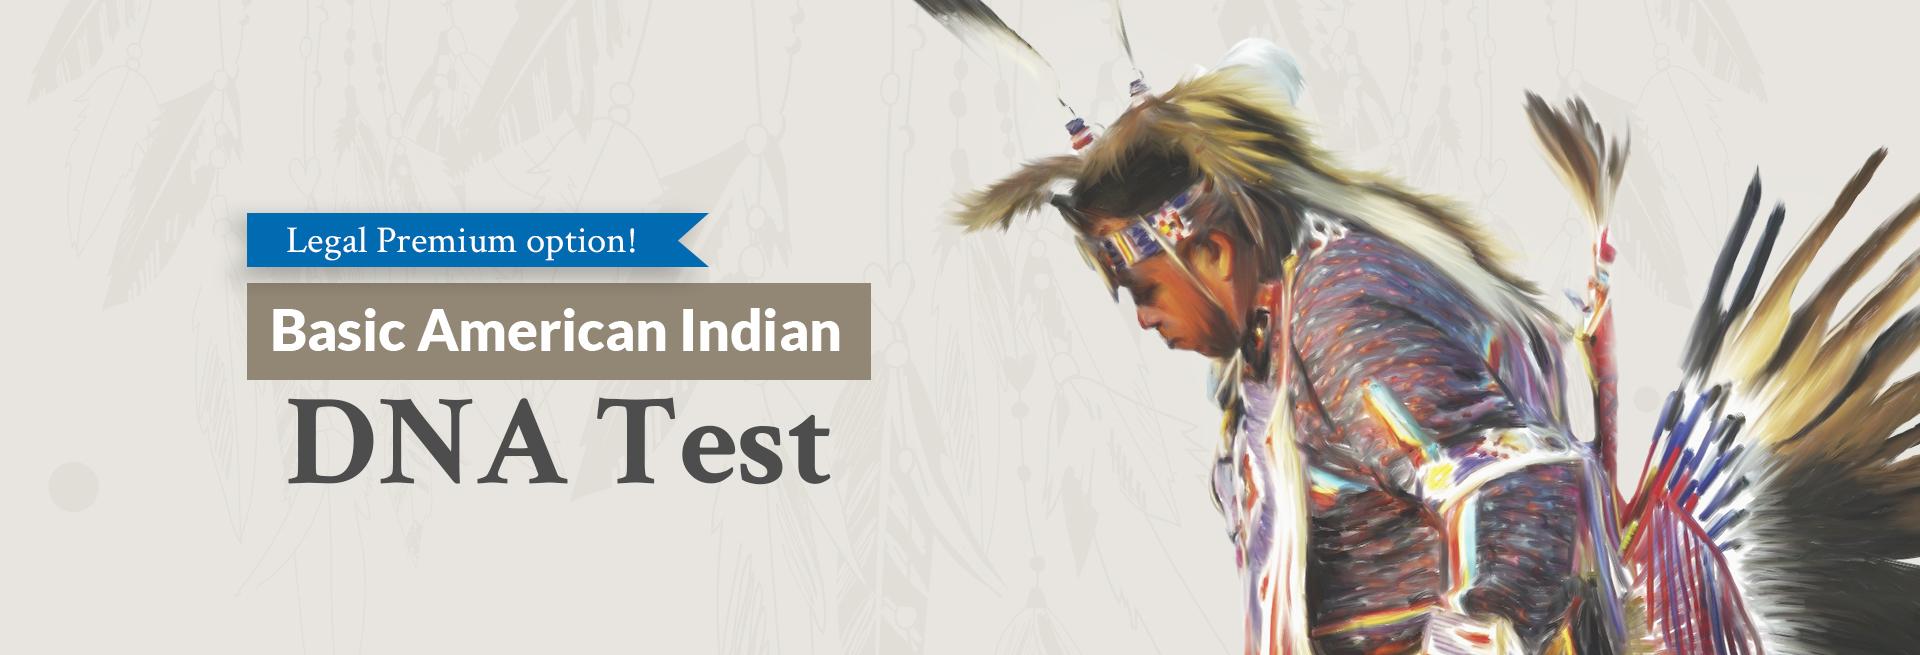 basic-American-Indian-dna-test